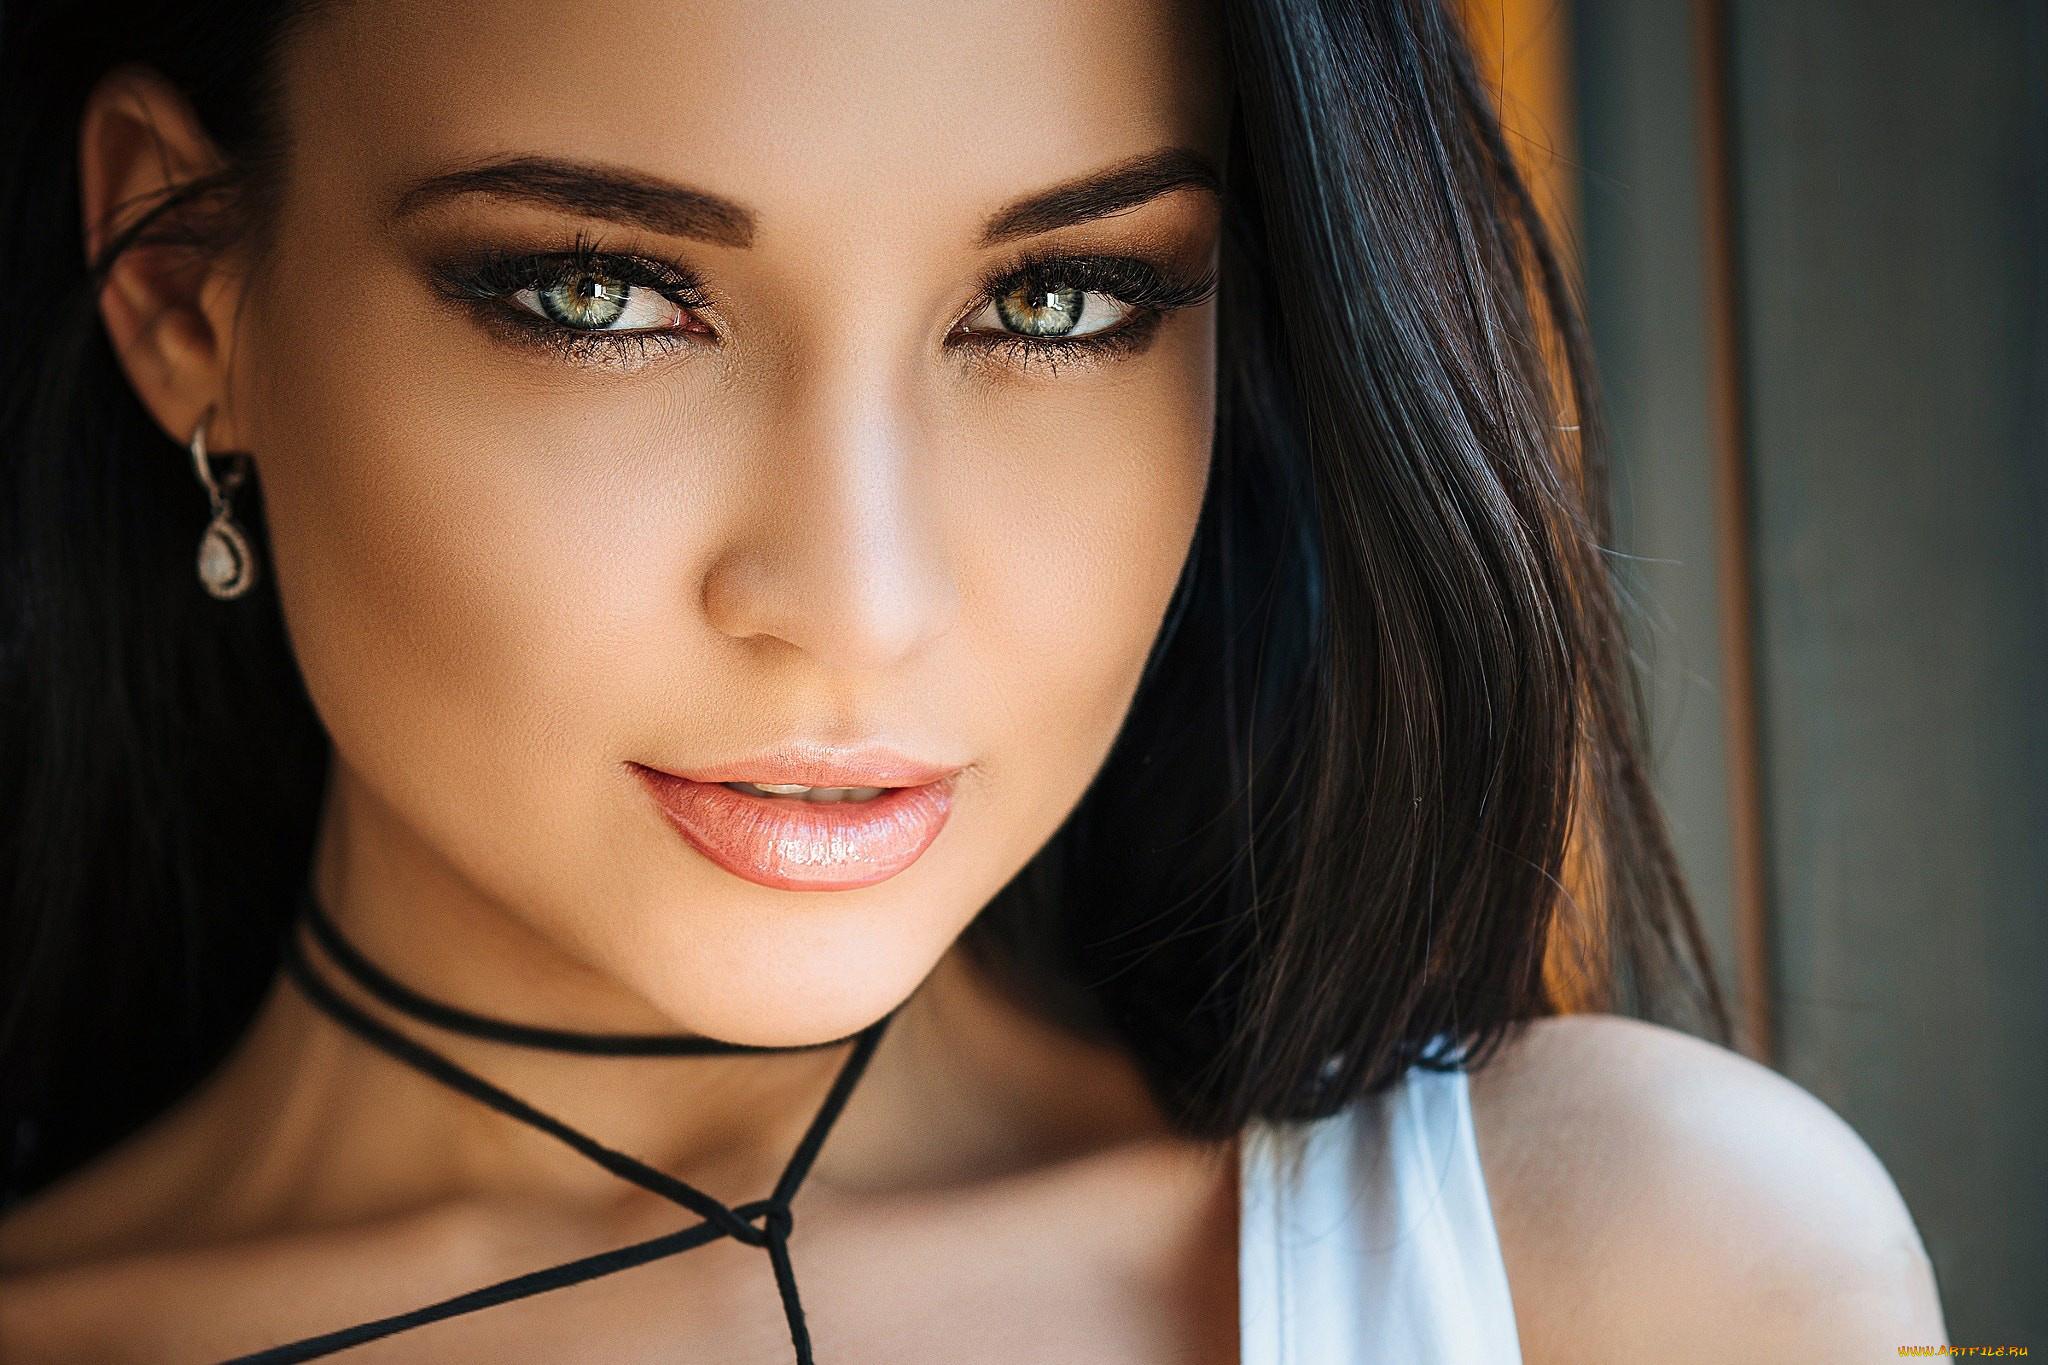 Девушка взгляд красотка брюнетка без смс